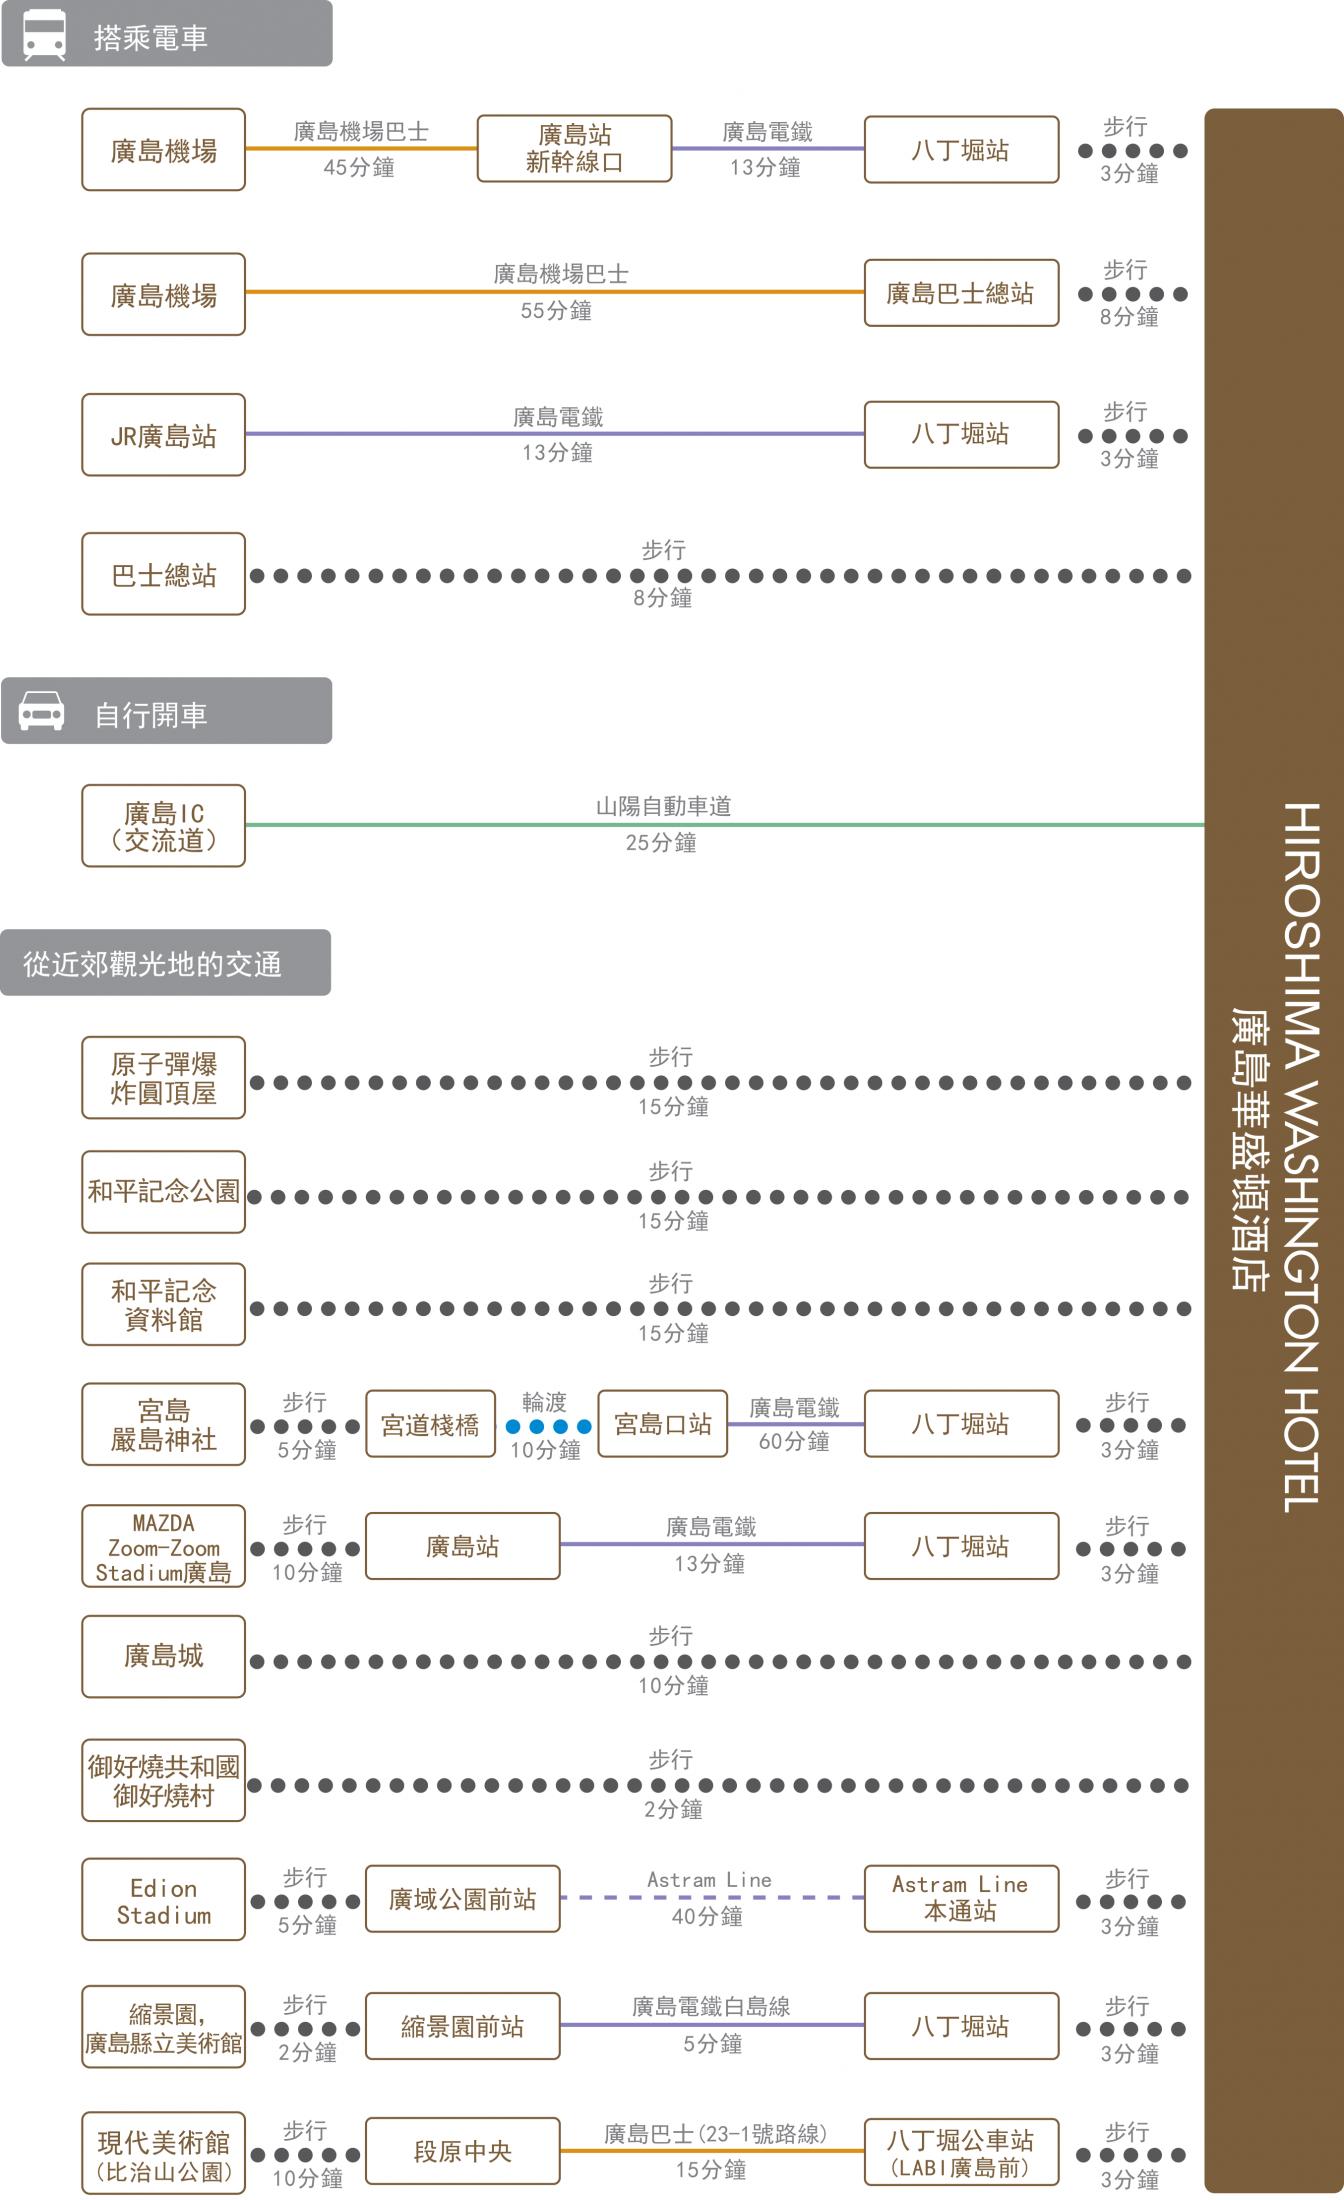 chart_zh_tw_hiroshima_wh